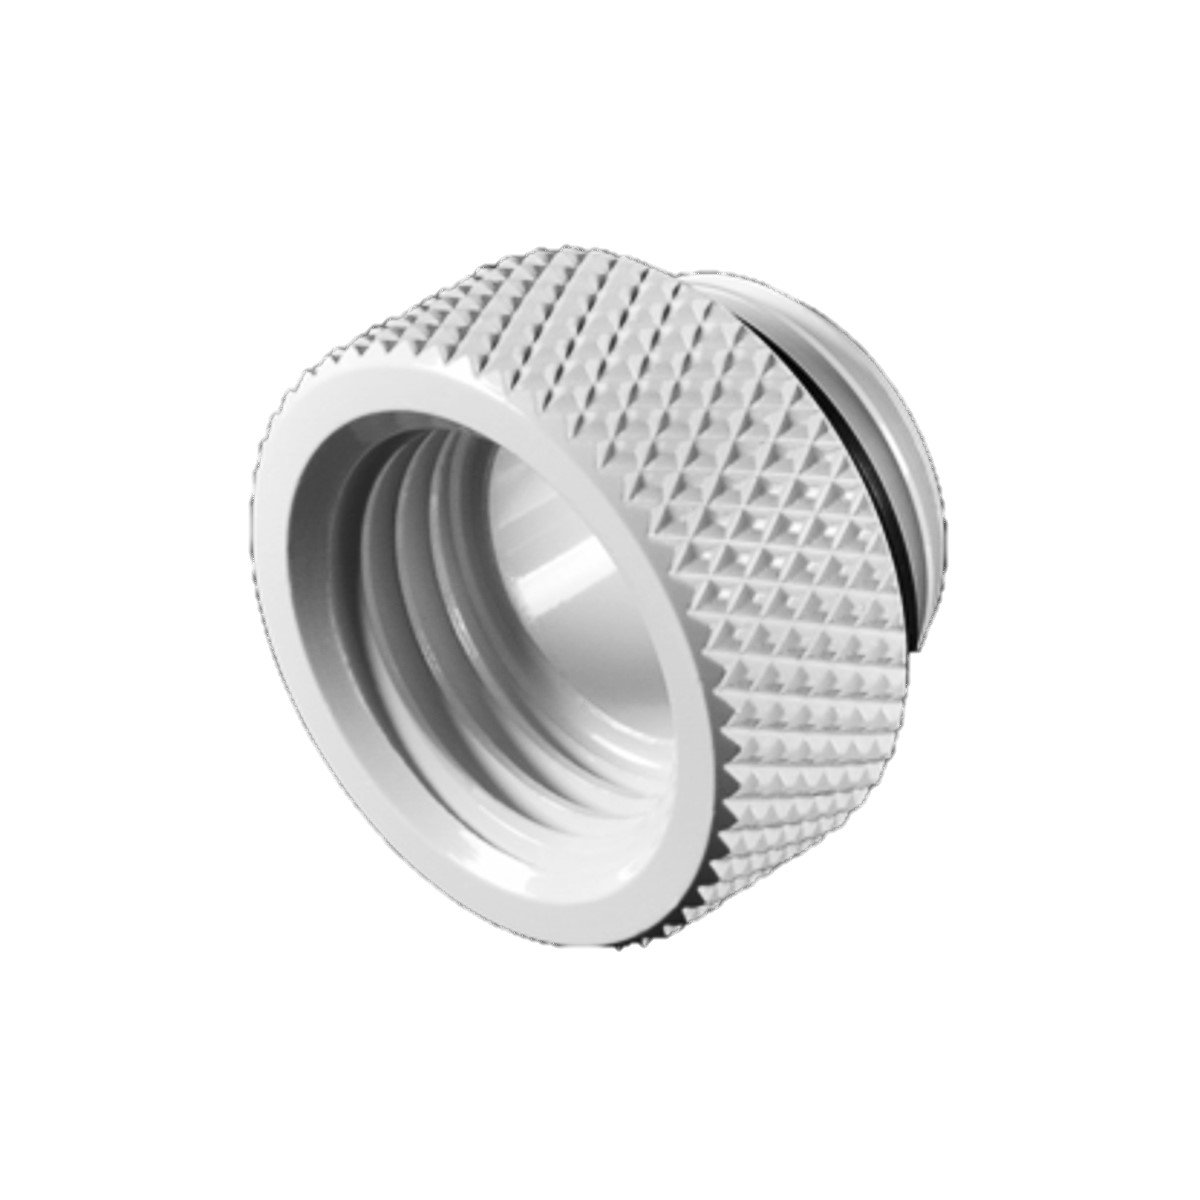 Bits Power IG 1/4 inch thread extender Deluxe White (BP-DWWP-C40)